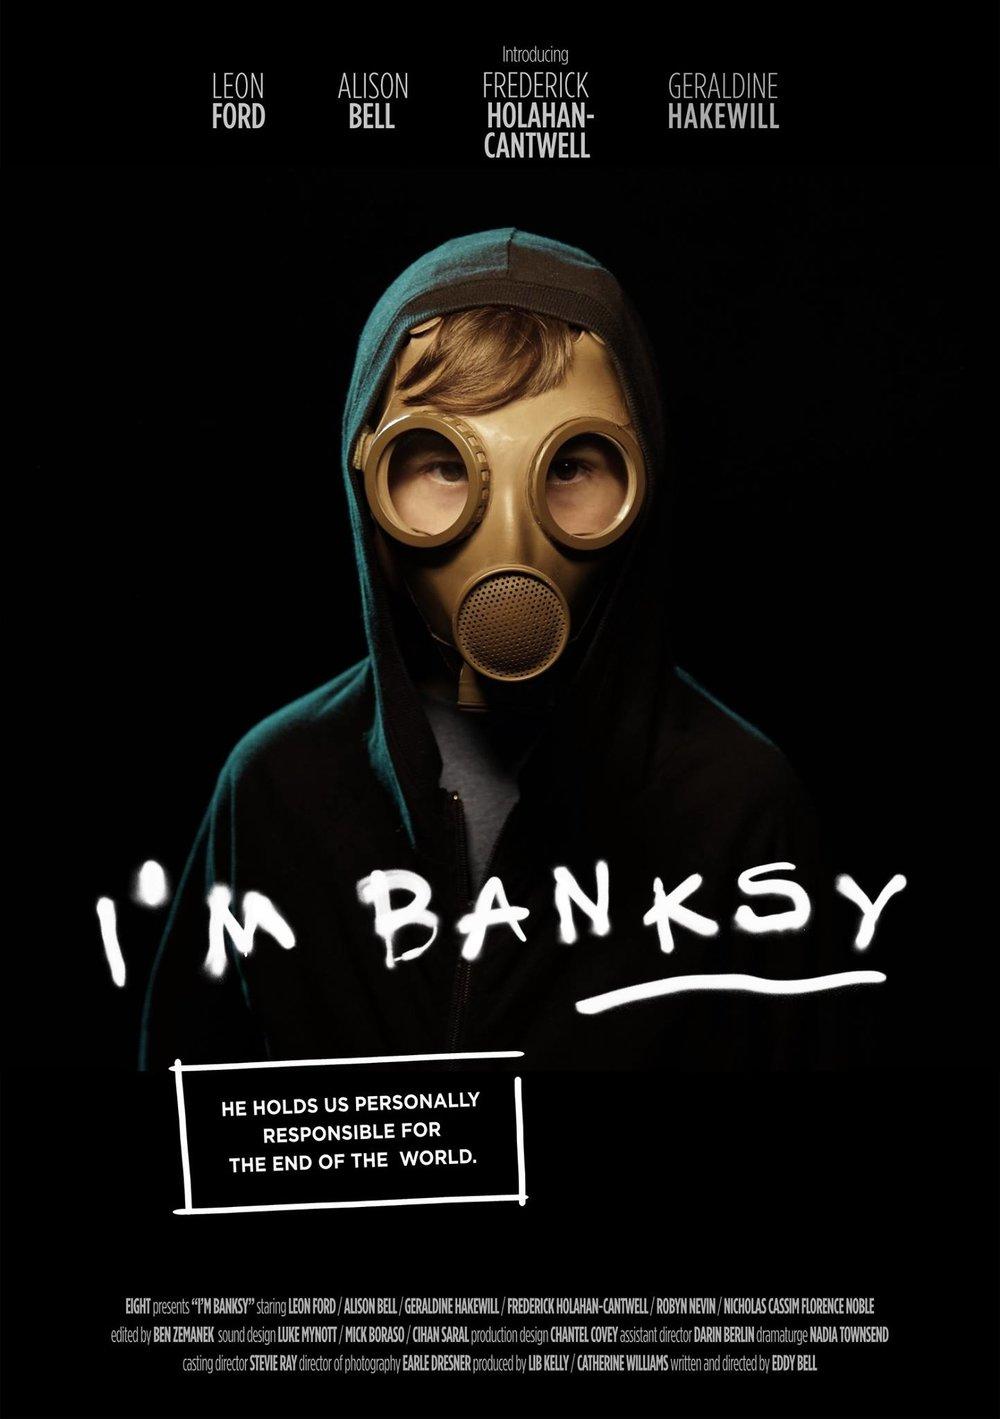 I'm-Banksy.jpg